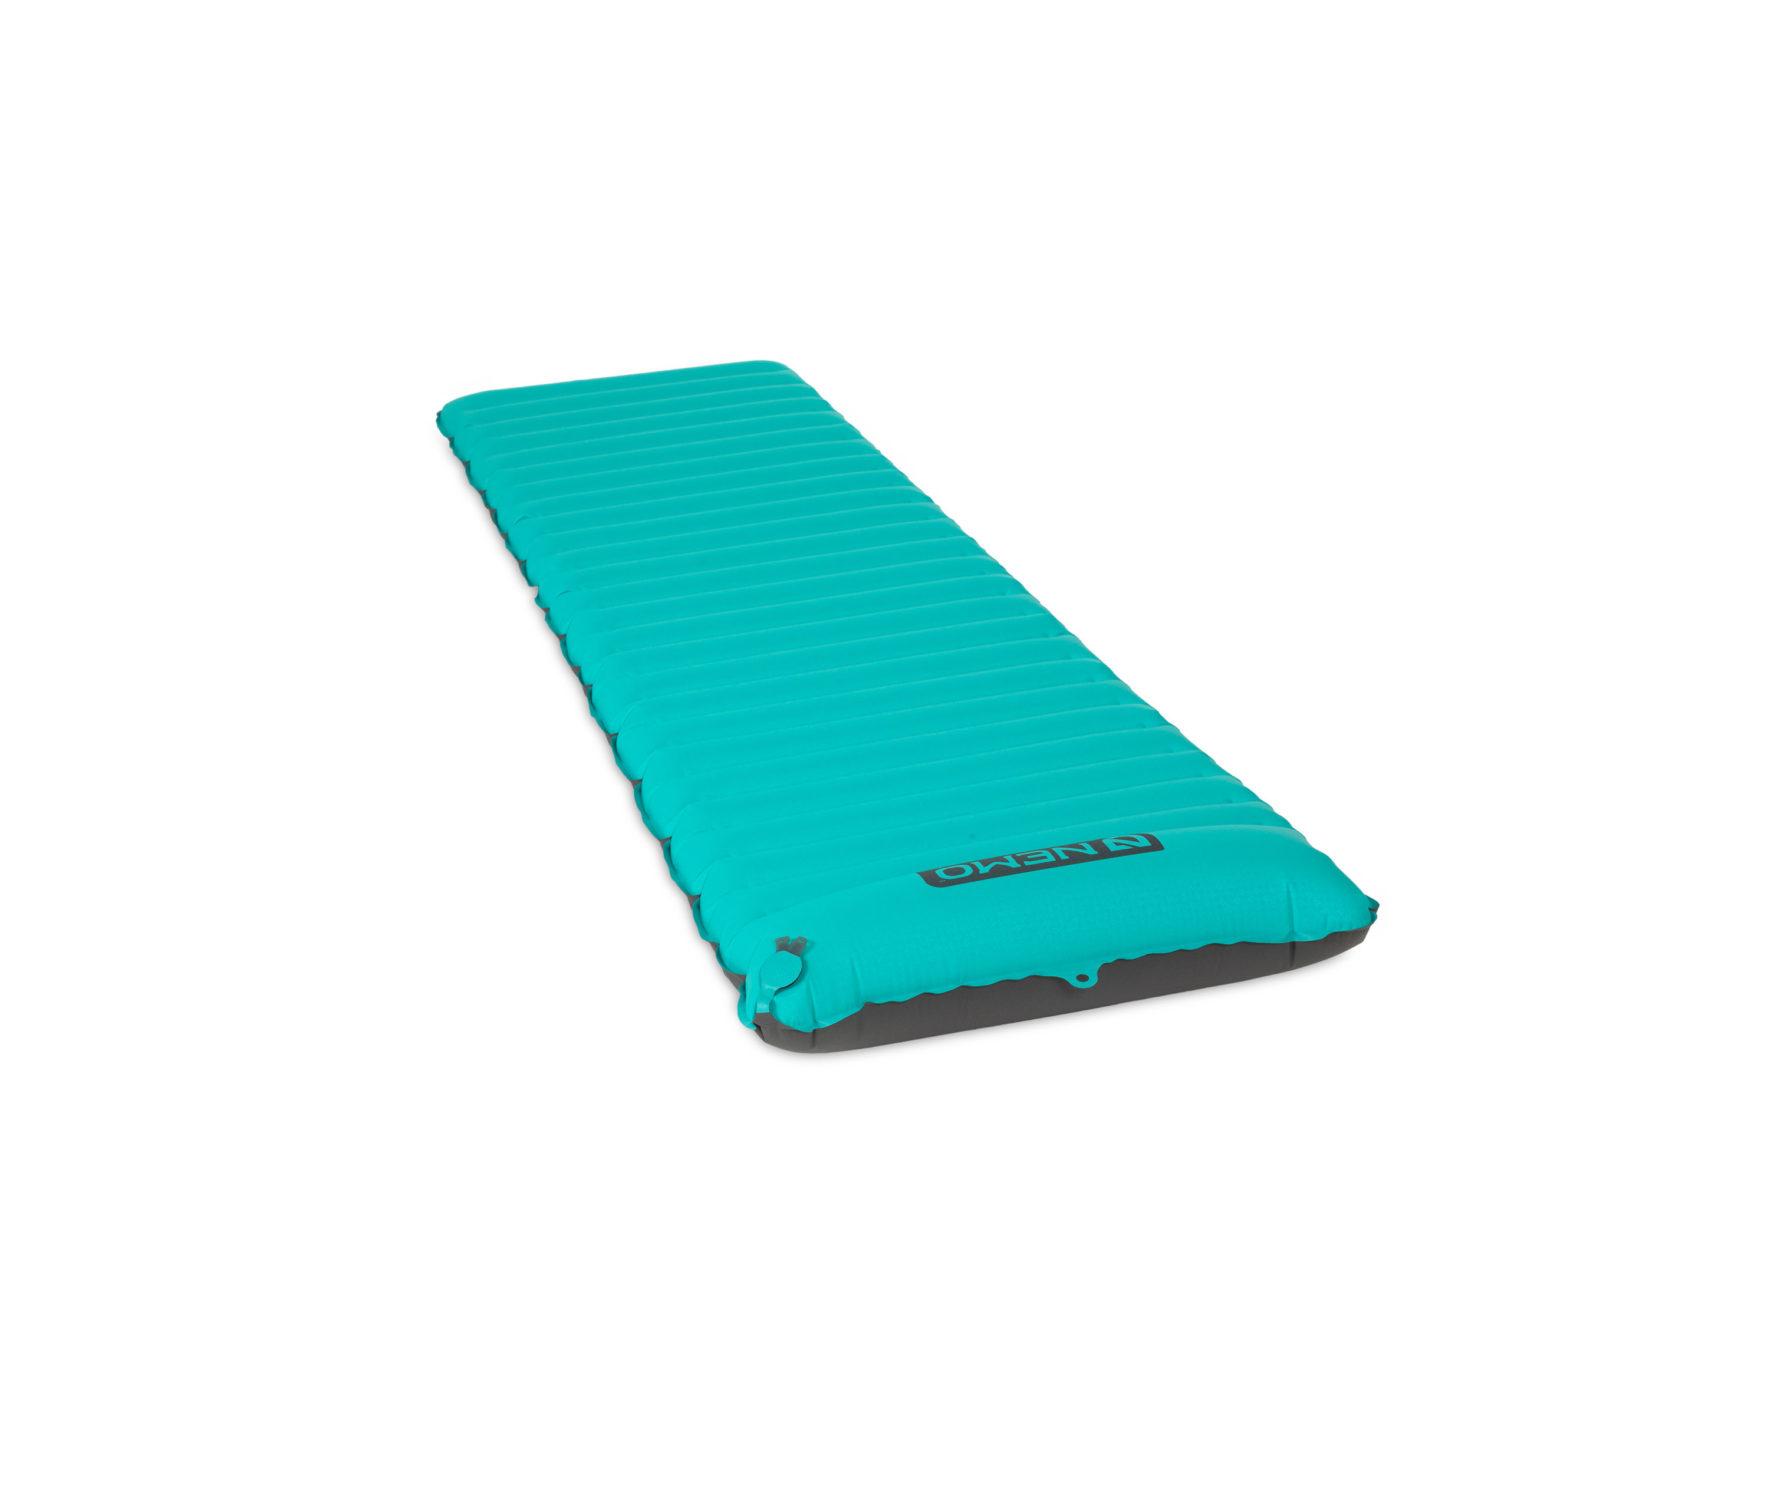 Nemo Astro - Sleeping pad